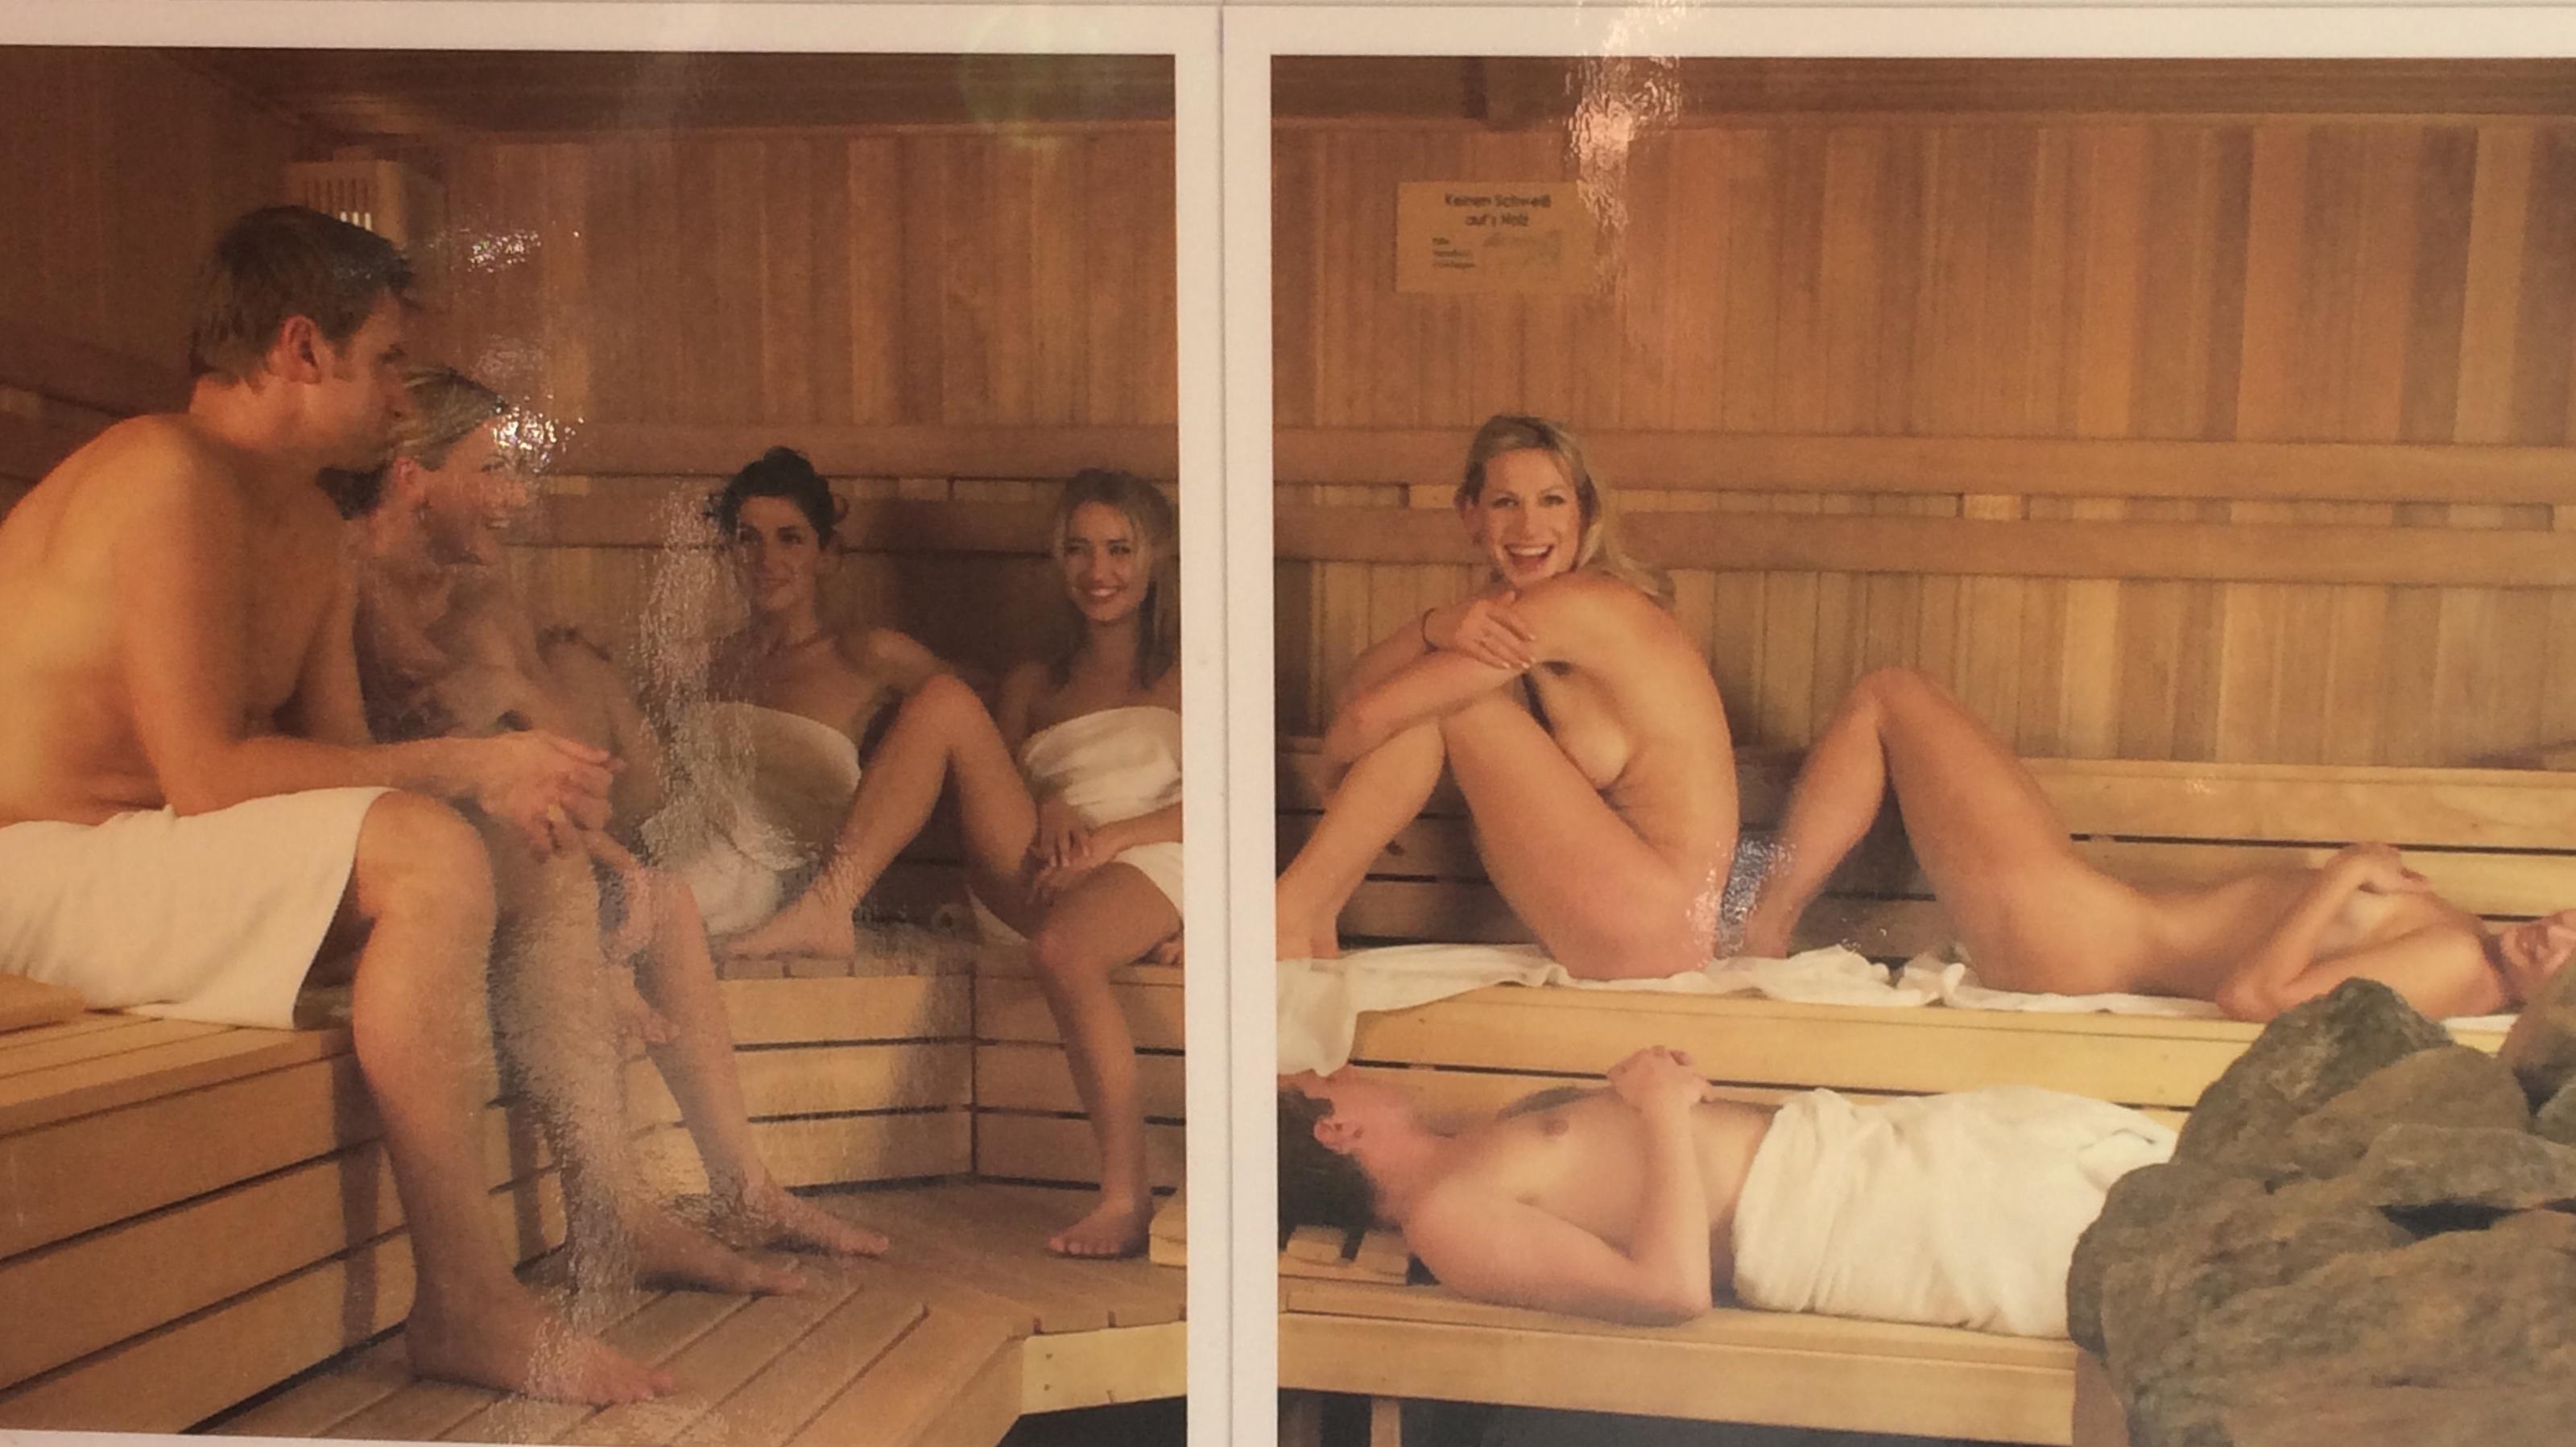 sexkontakte berlin city relax massage